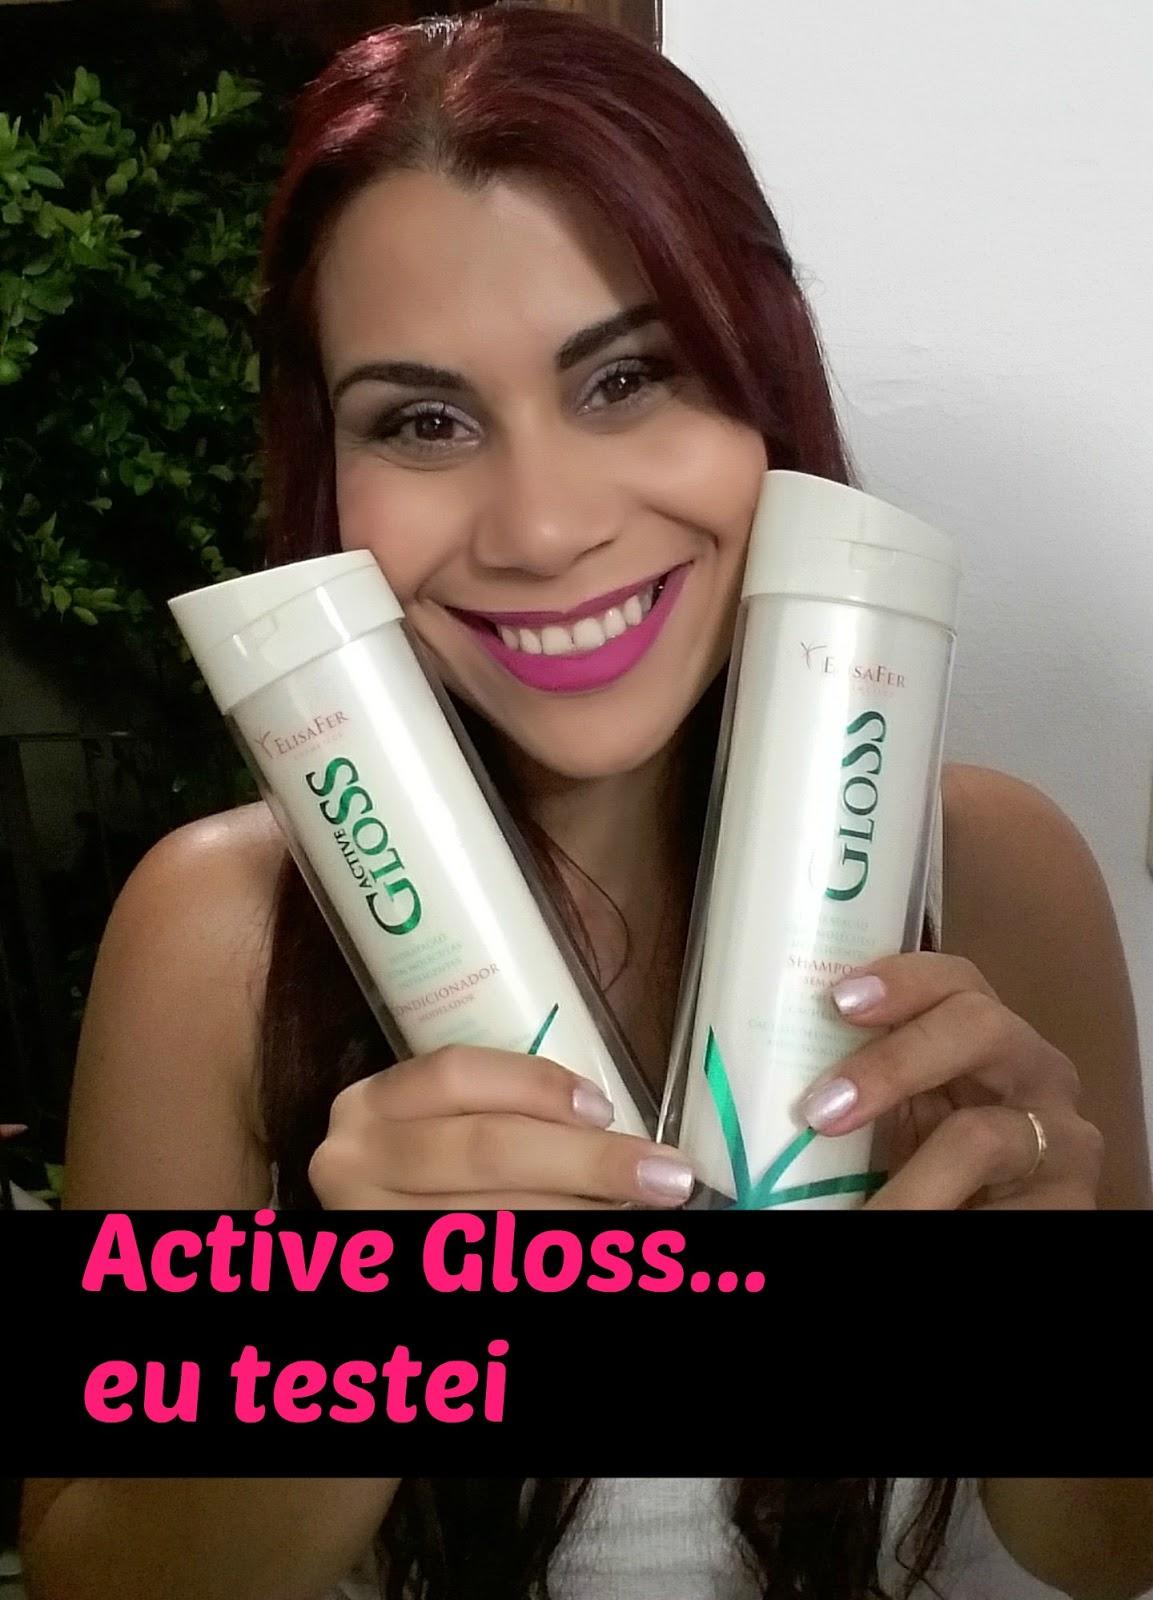 Active Gloss  cabelos cacheados resenha blog estilo modas e manias